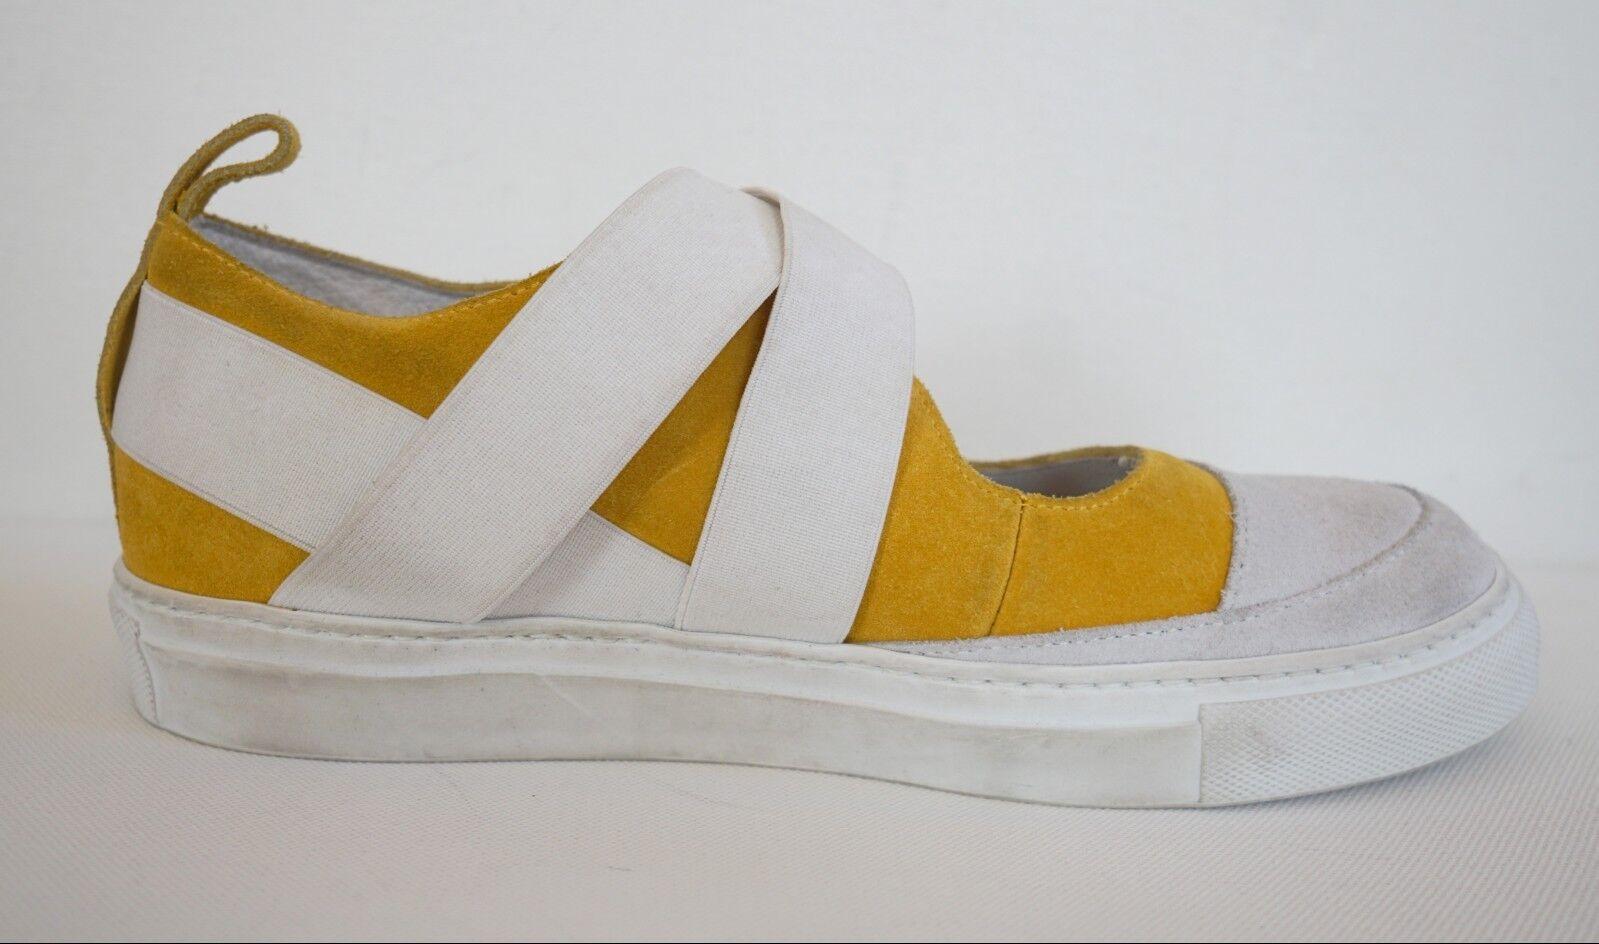 MASNADA Suede Sneakers Sneakers Sneakers shoes EUR-39 US-9 b537fc